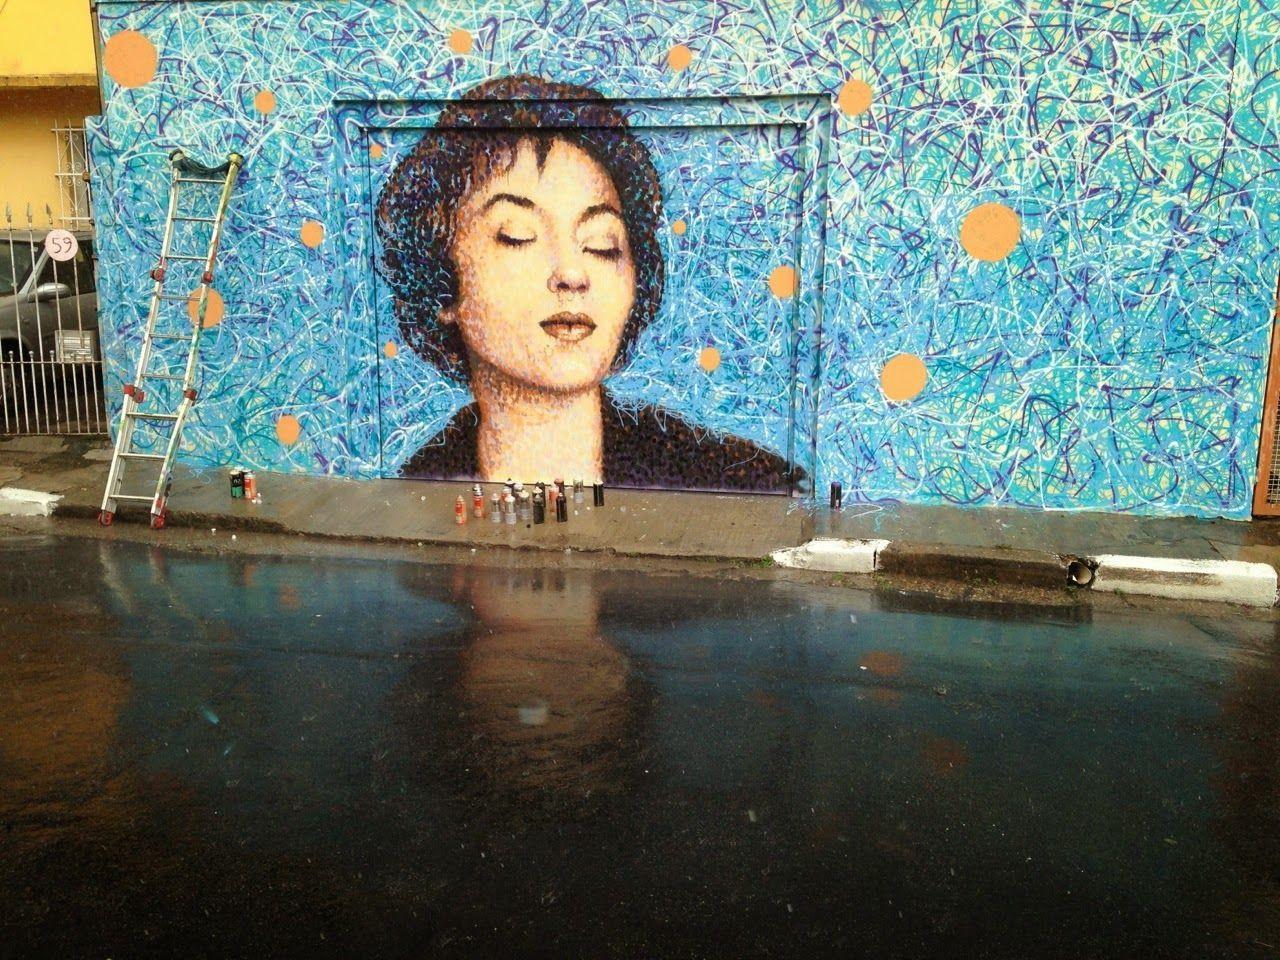 Sliks x Jimmy C New Collaboration – Sao Paulo, Brazil